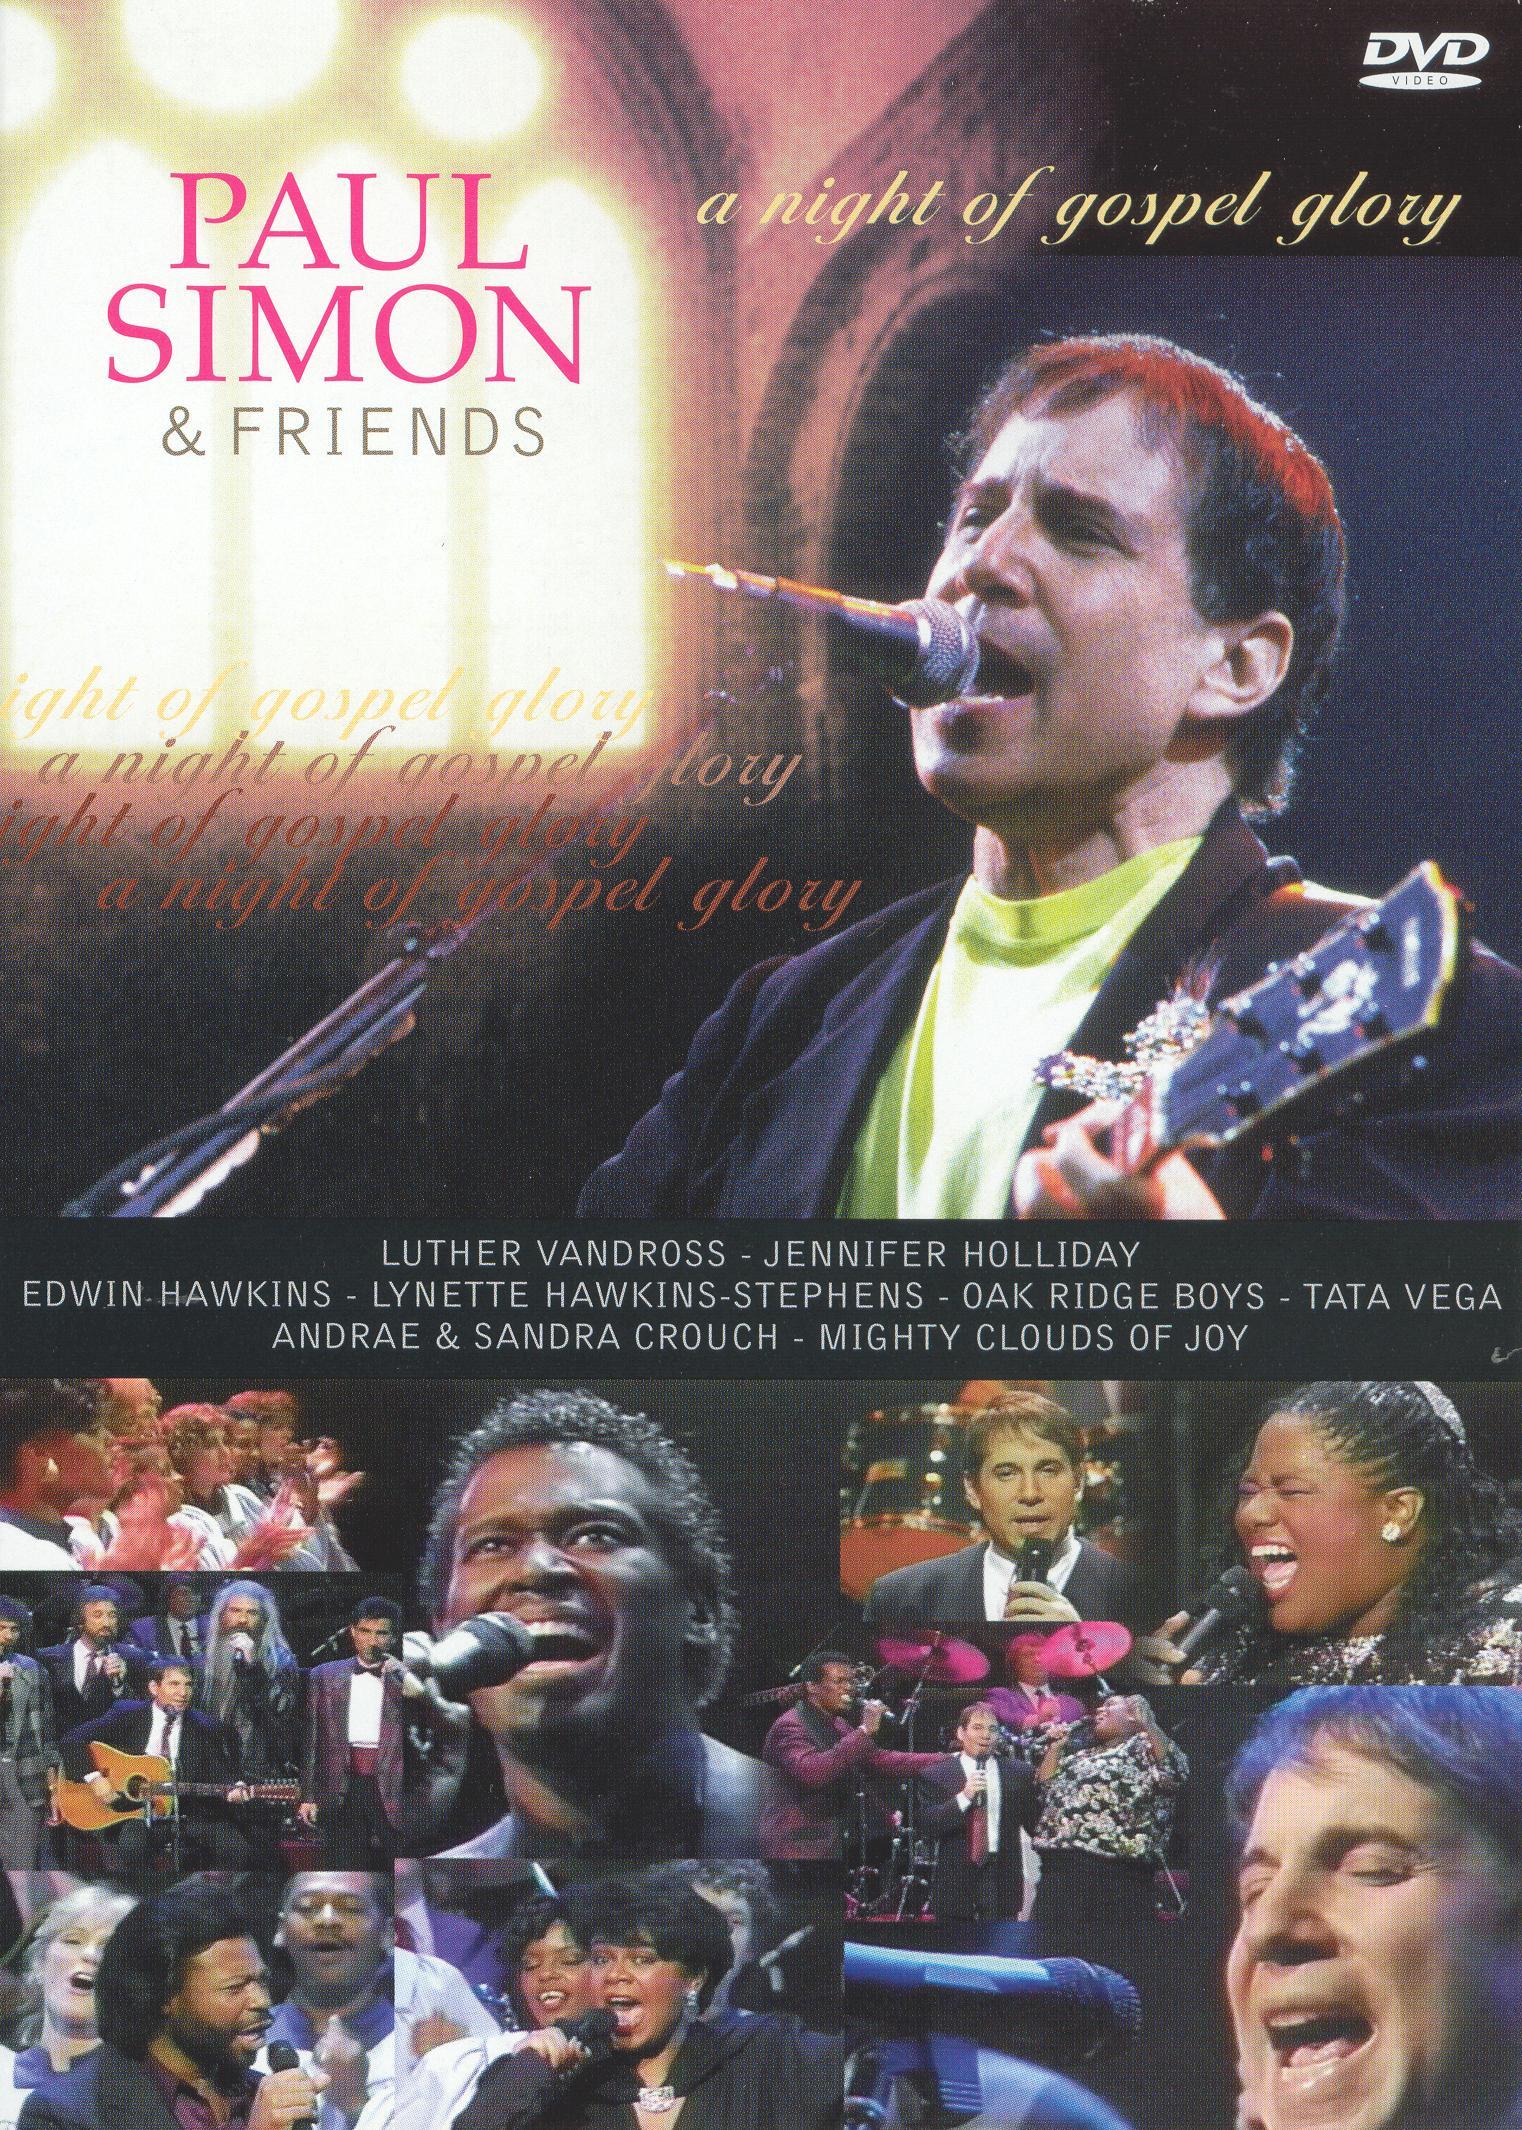 Paul Simon and Friends: Night of Gospel Glory